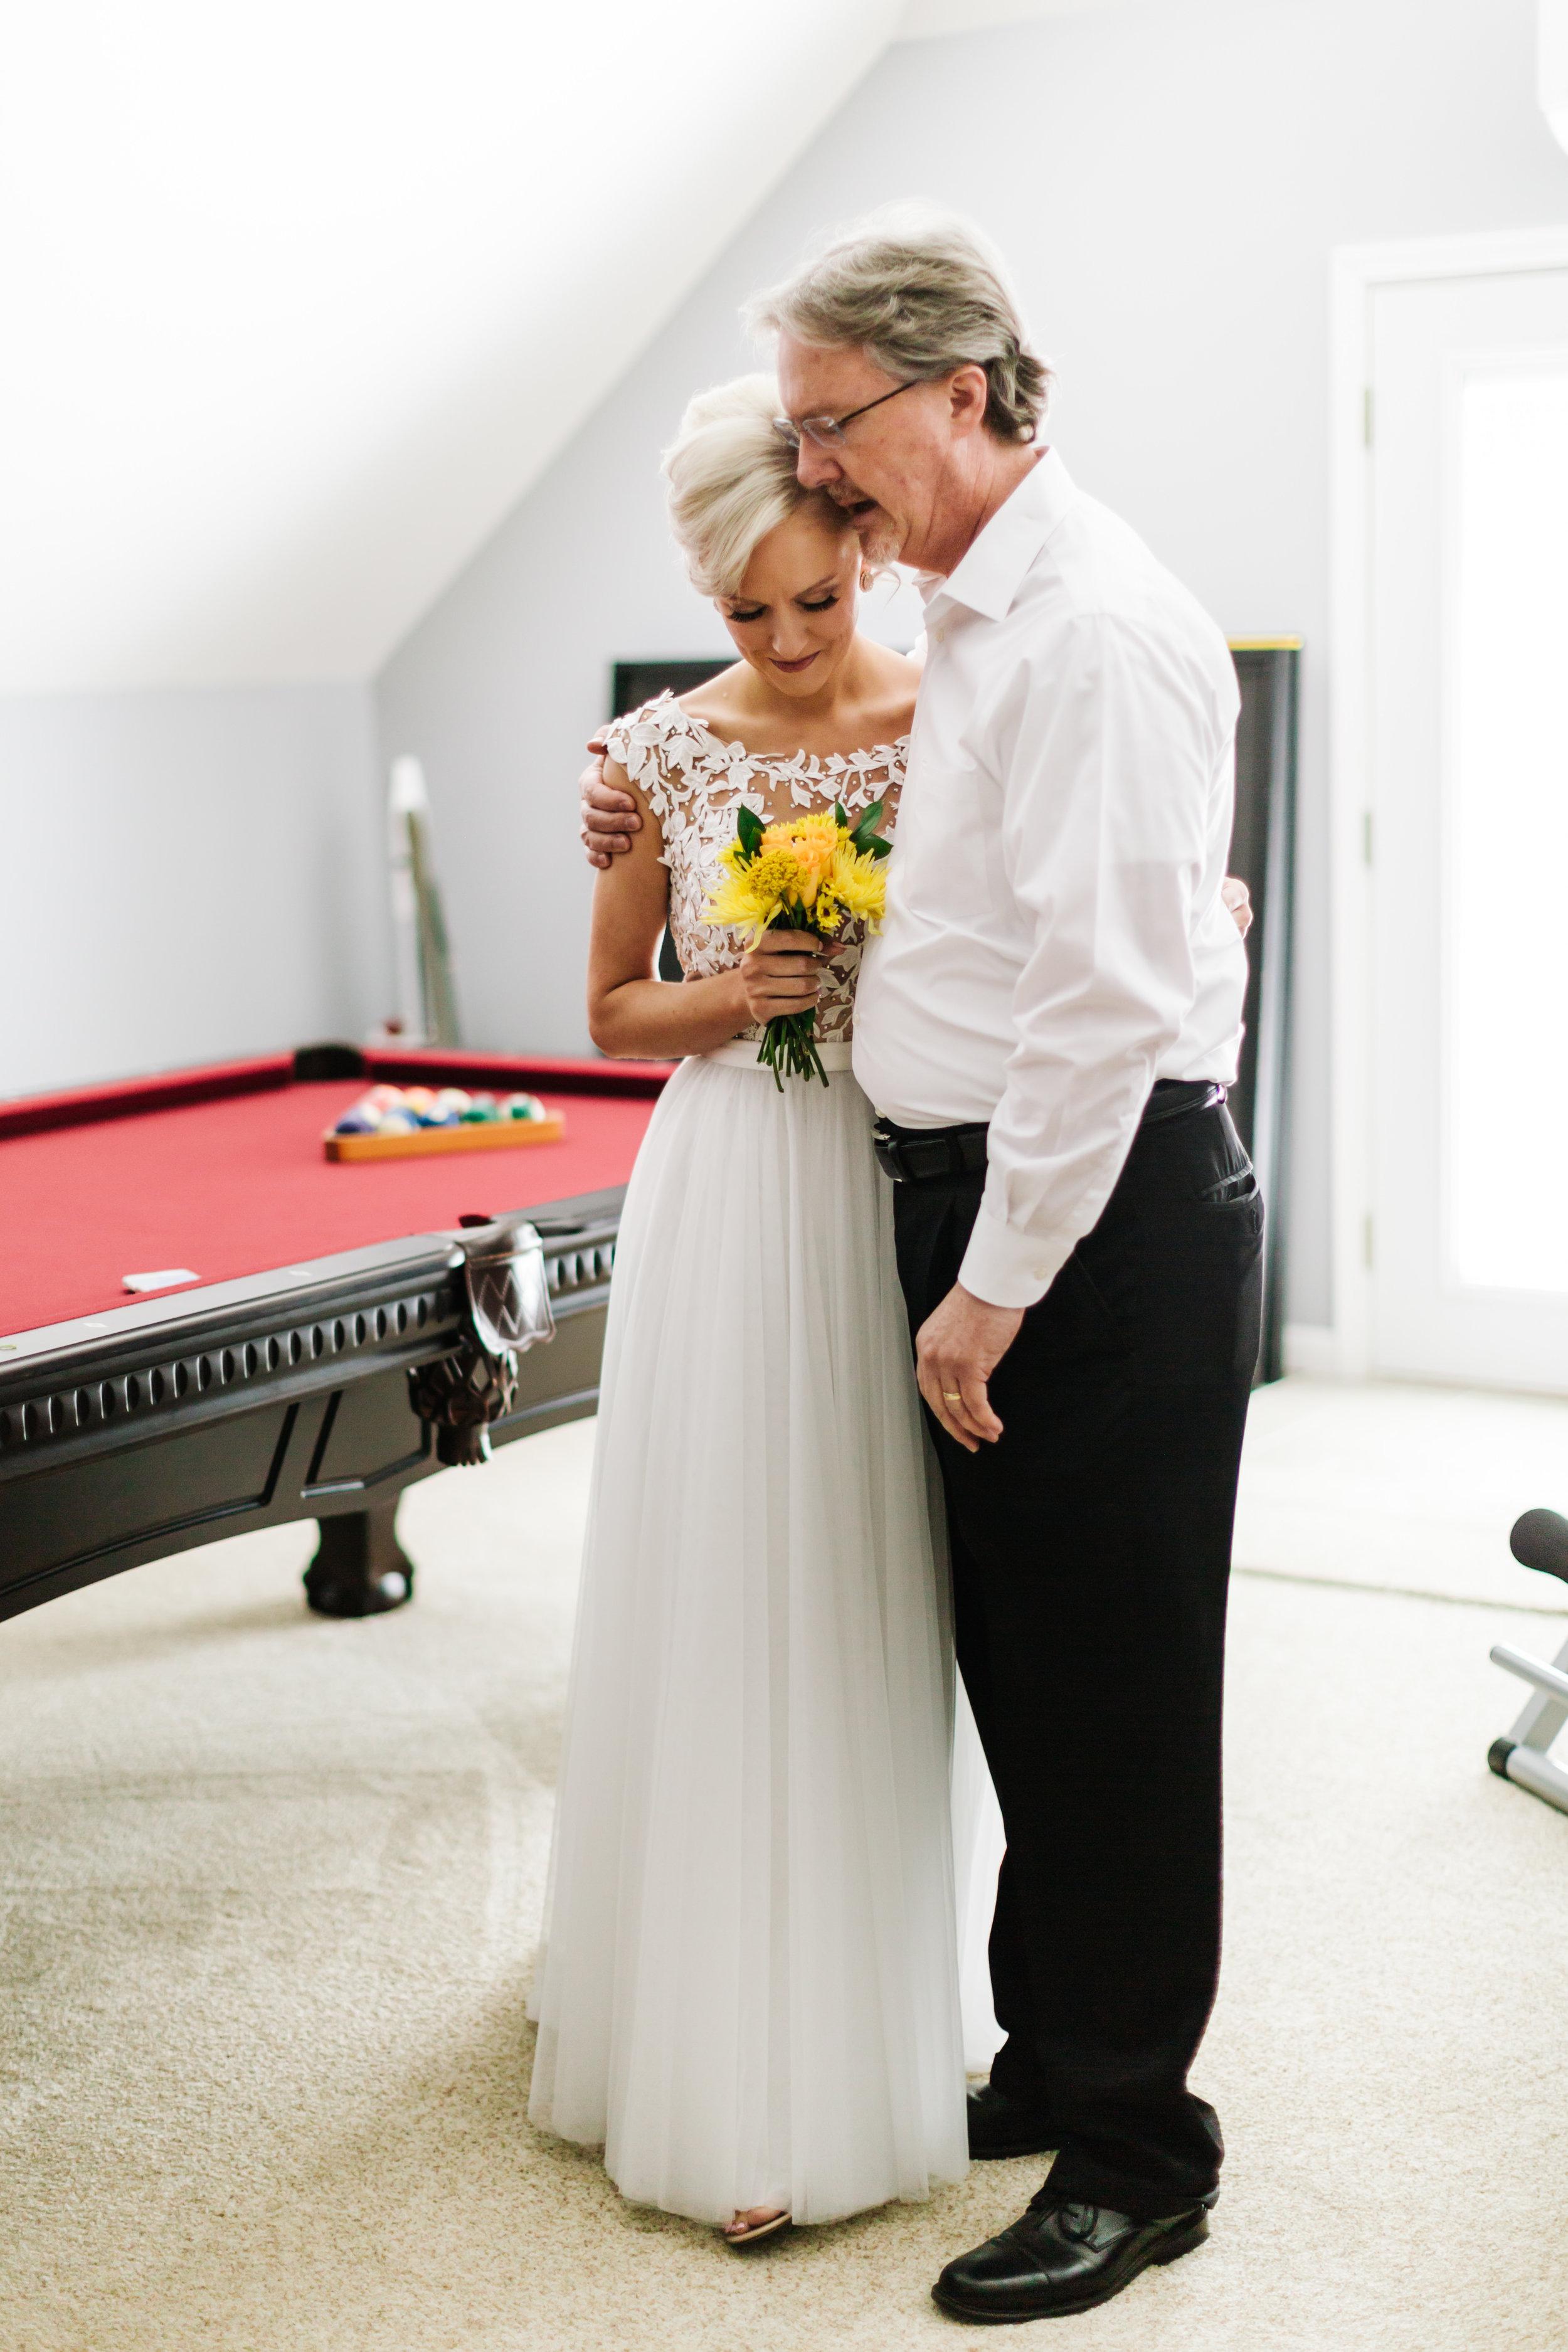 2018.09.02 Ray and Sarah Prizner Nashville TN Wedding FINALS-218.jpg